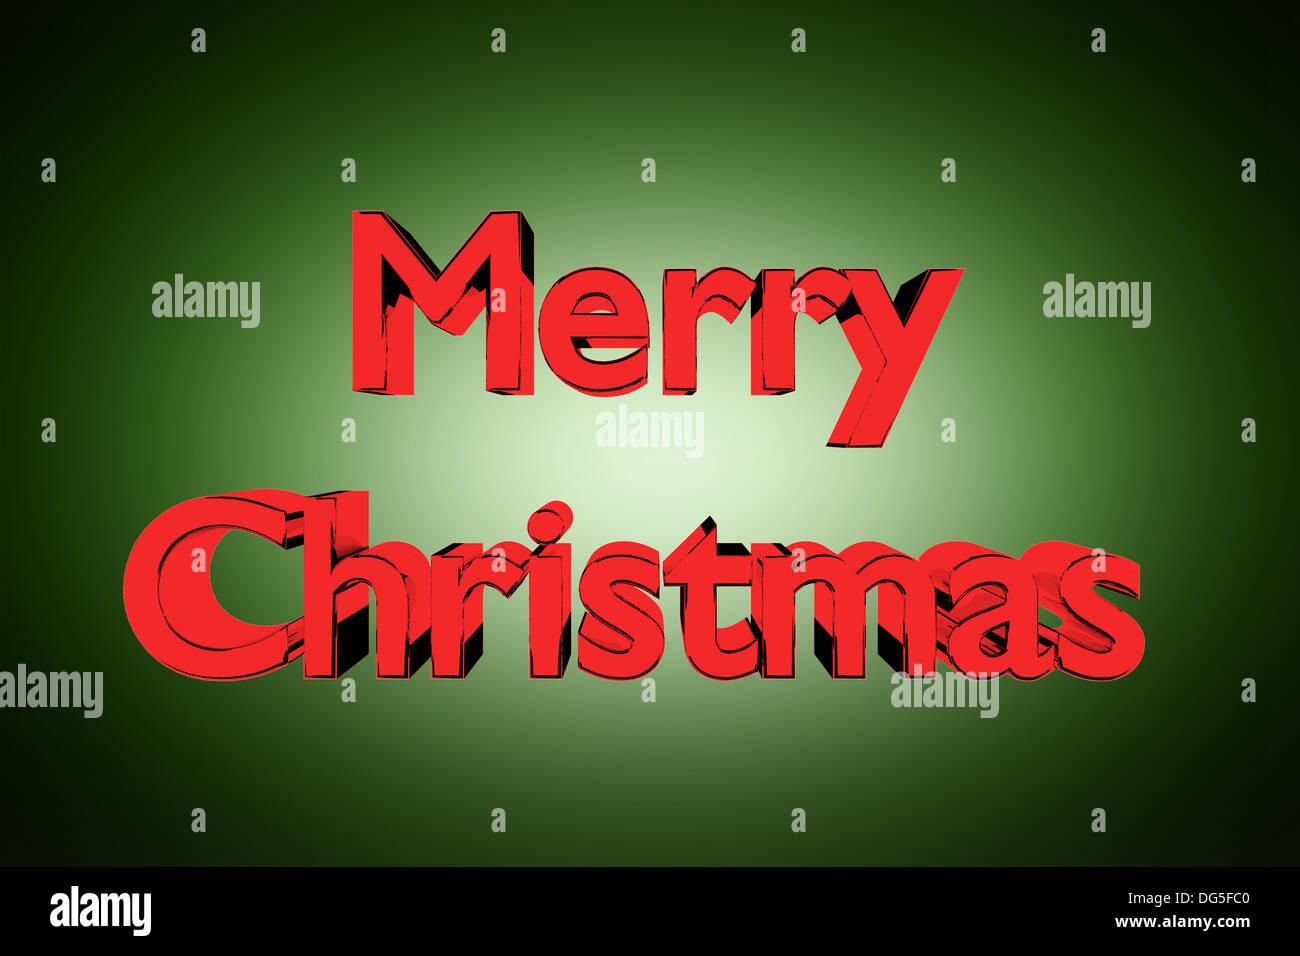 3D Illustration of golden Merry Christmas lettering on green background - Stock Image